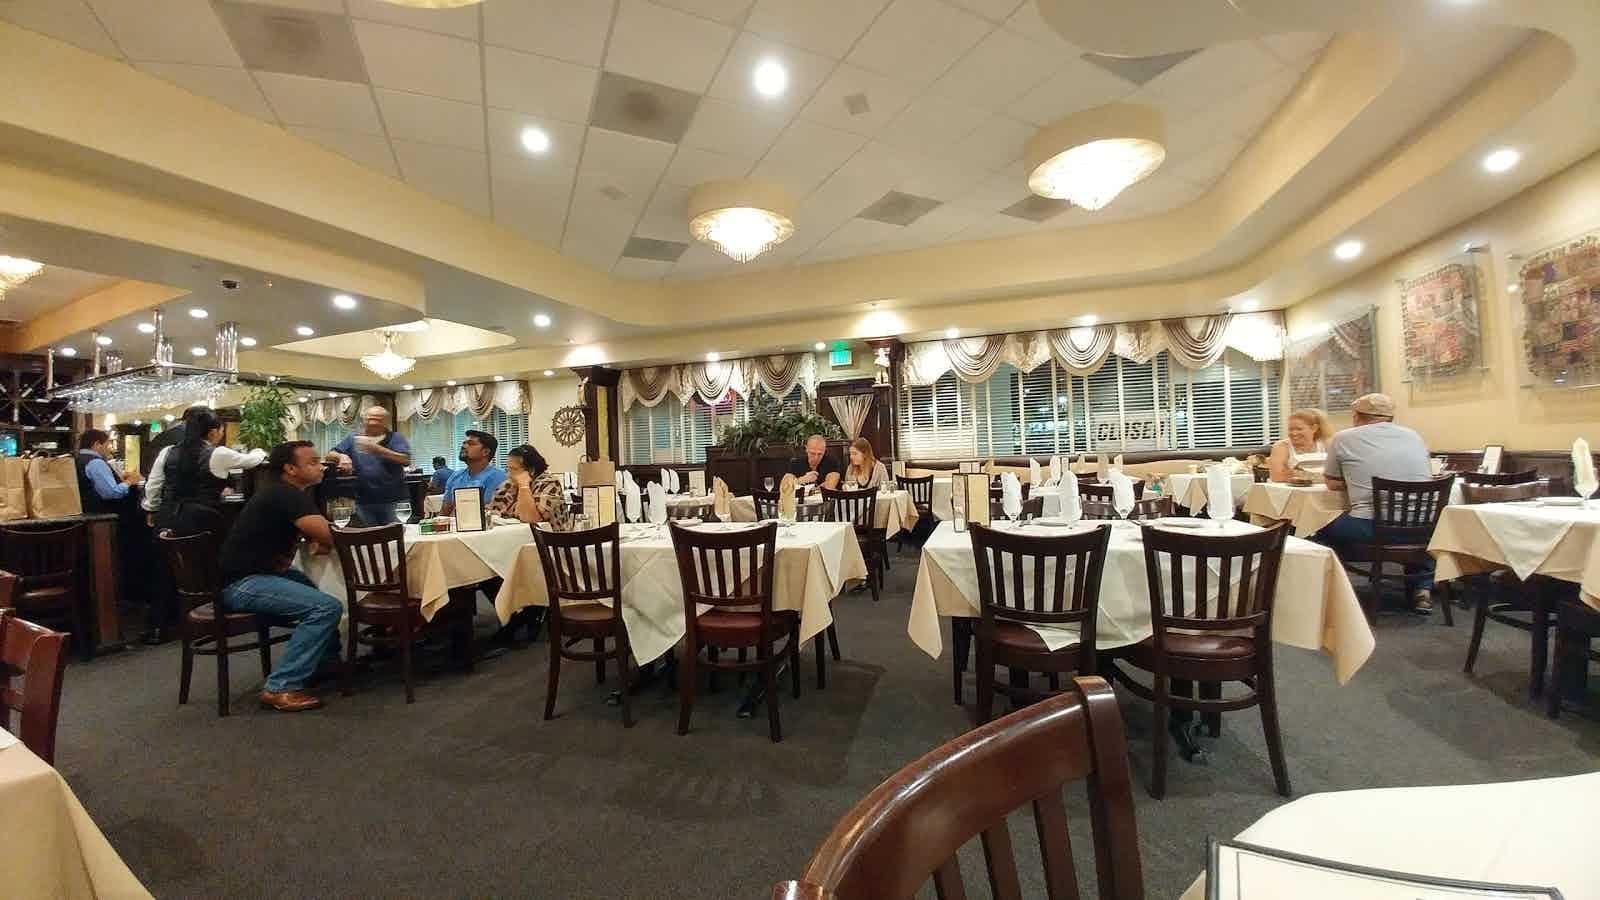 The India Restaurant Artesia Restaurant Review Zagat